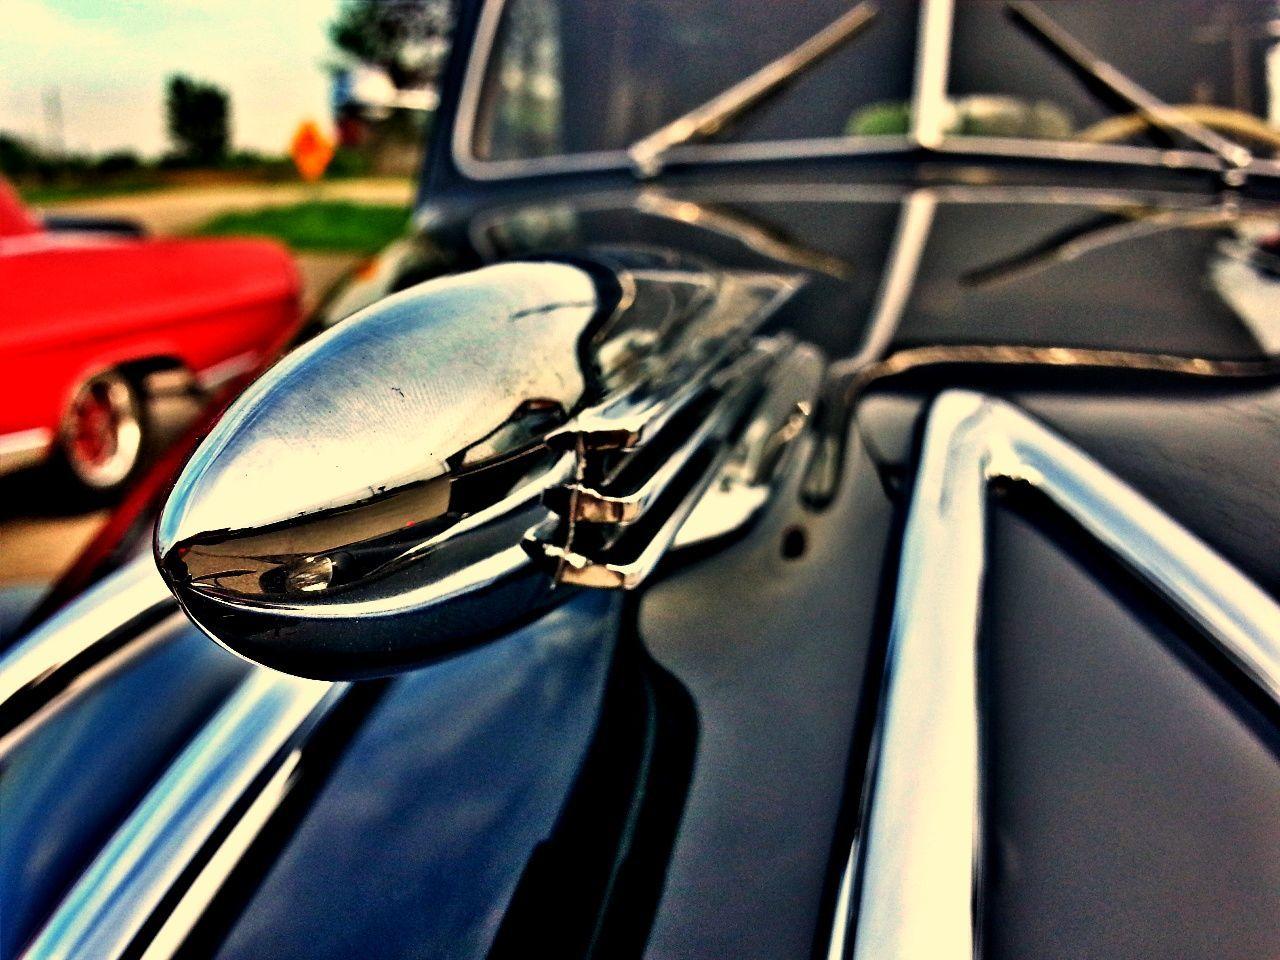 Detail shot of a car